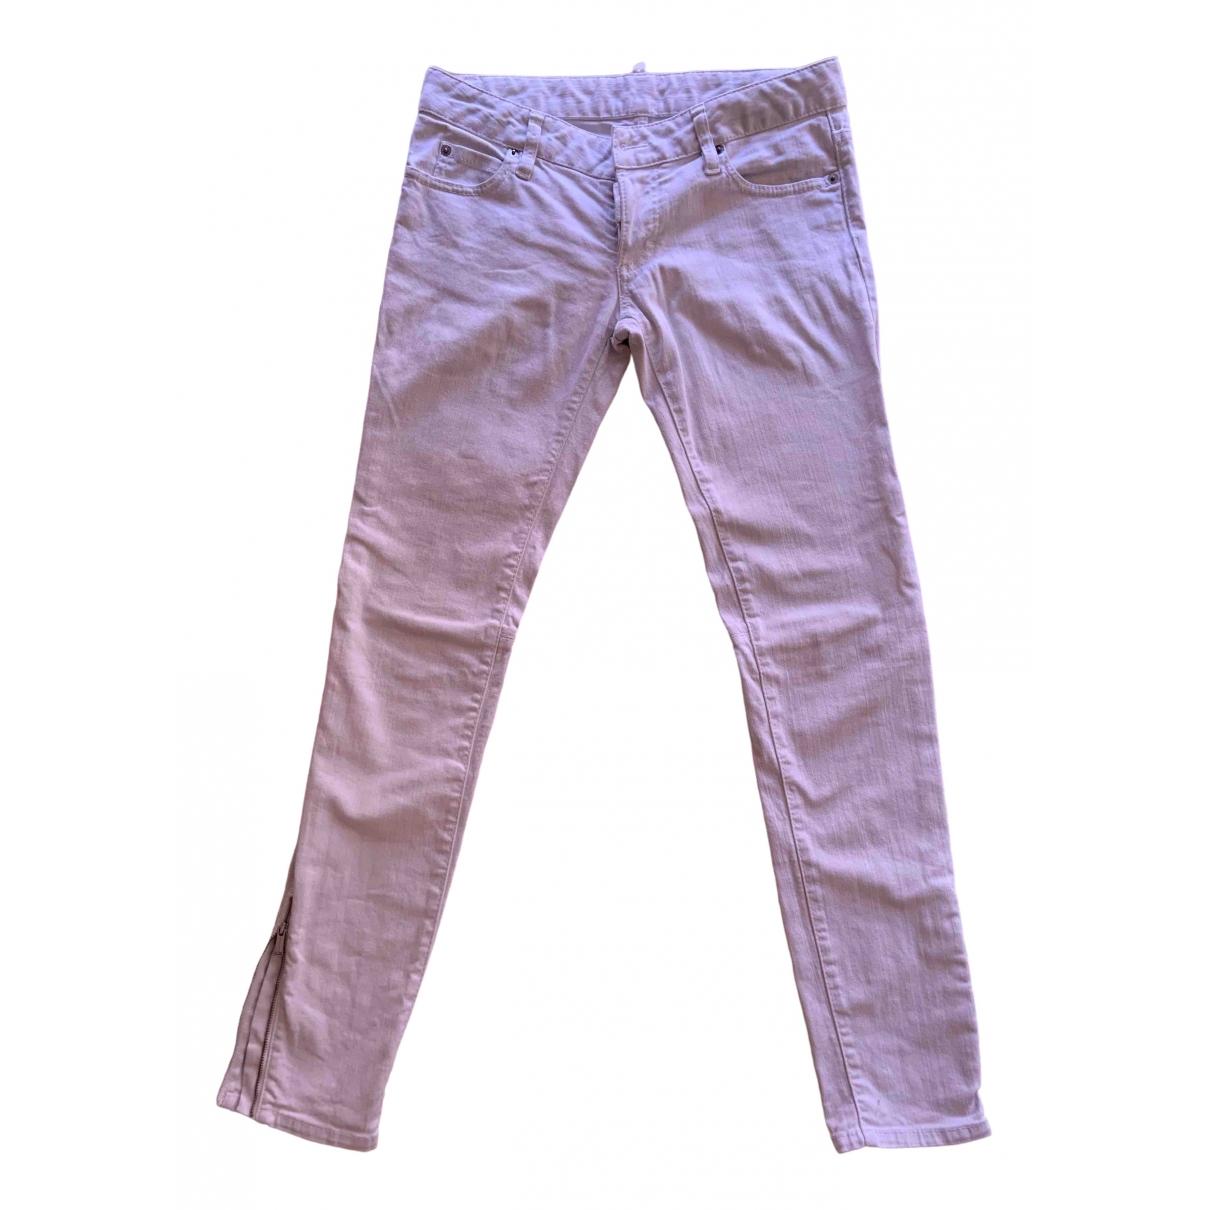 Dsquared2 \N White Cotton - elasthane Jeans for Women 38 FR